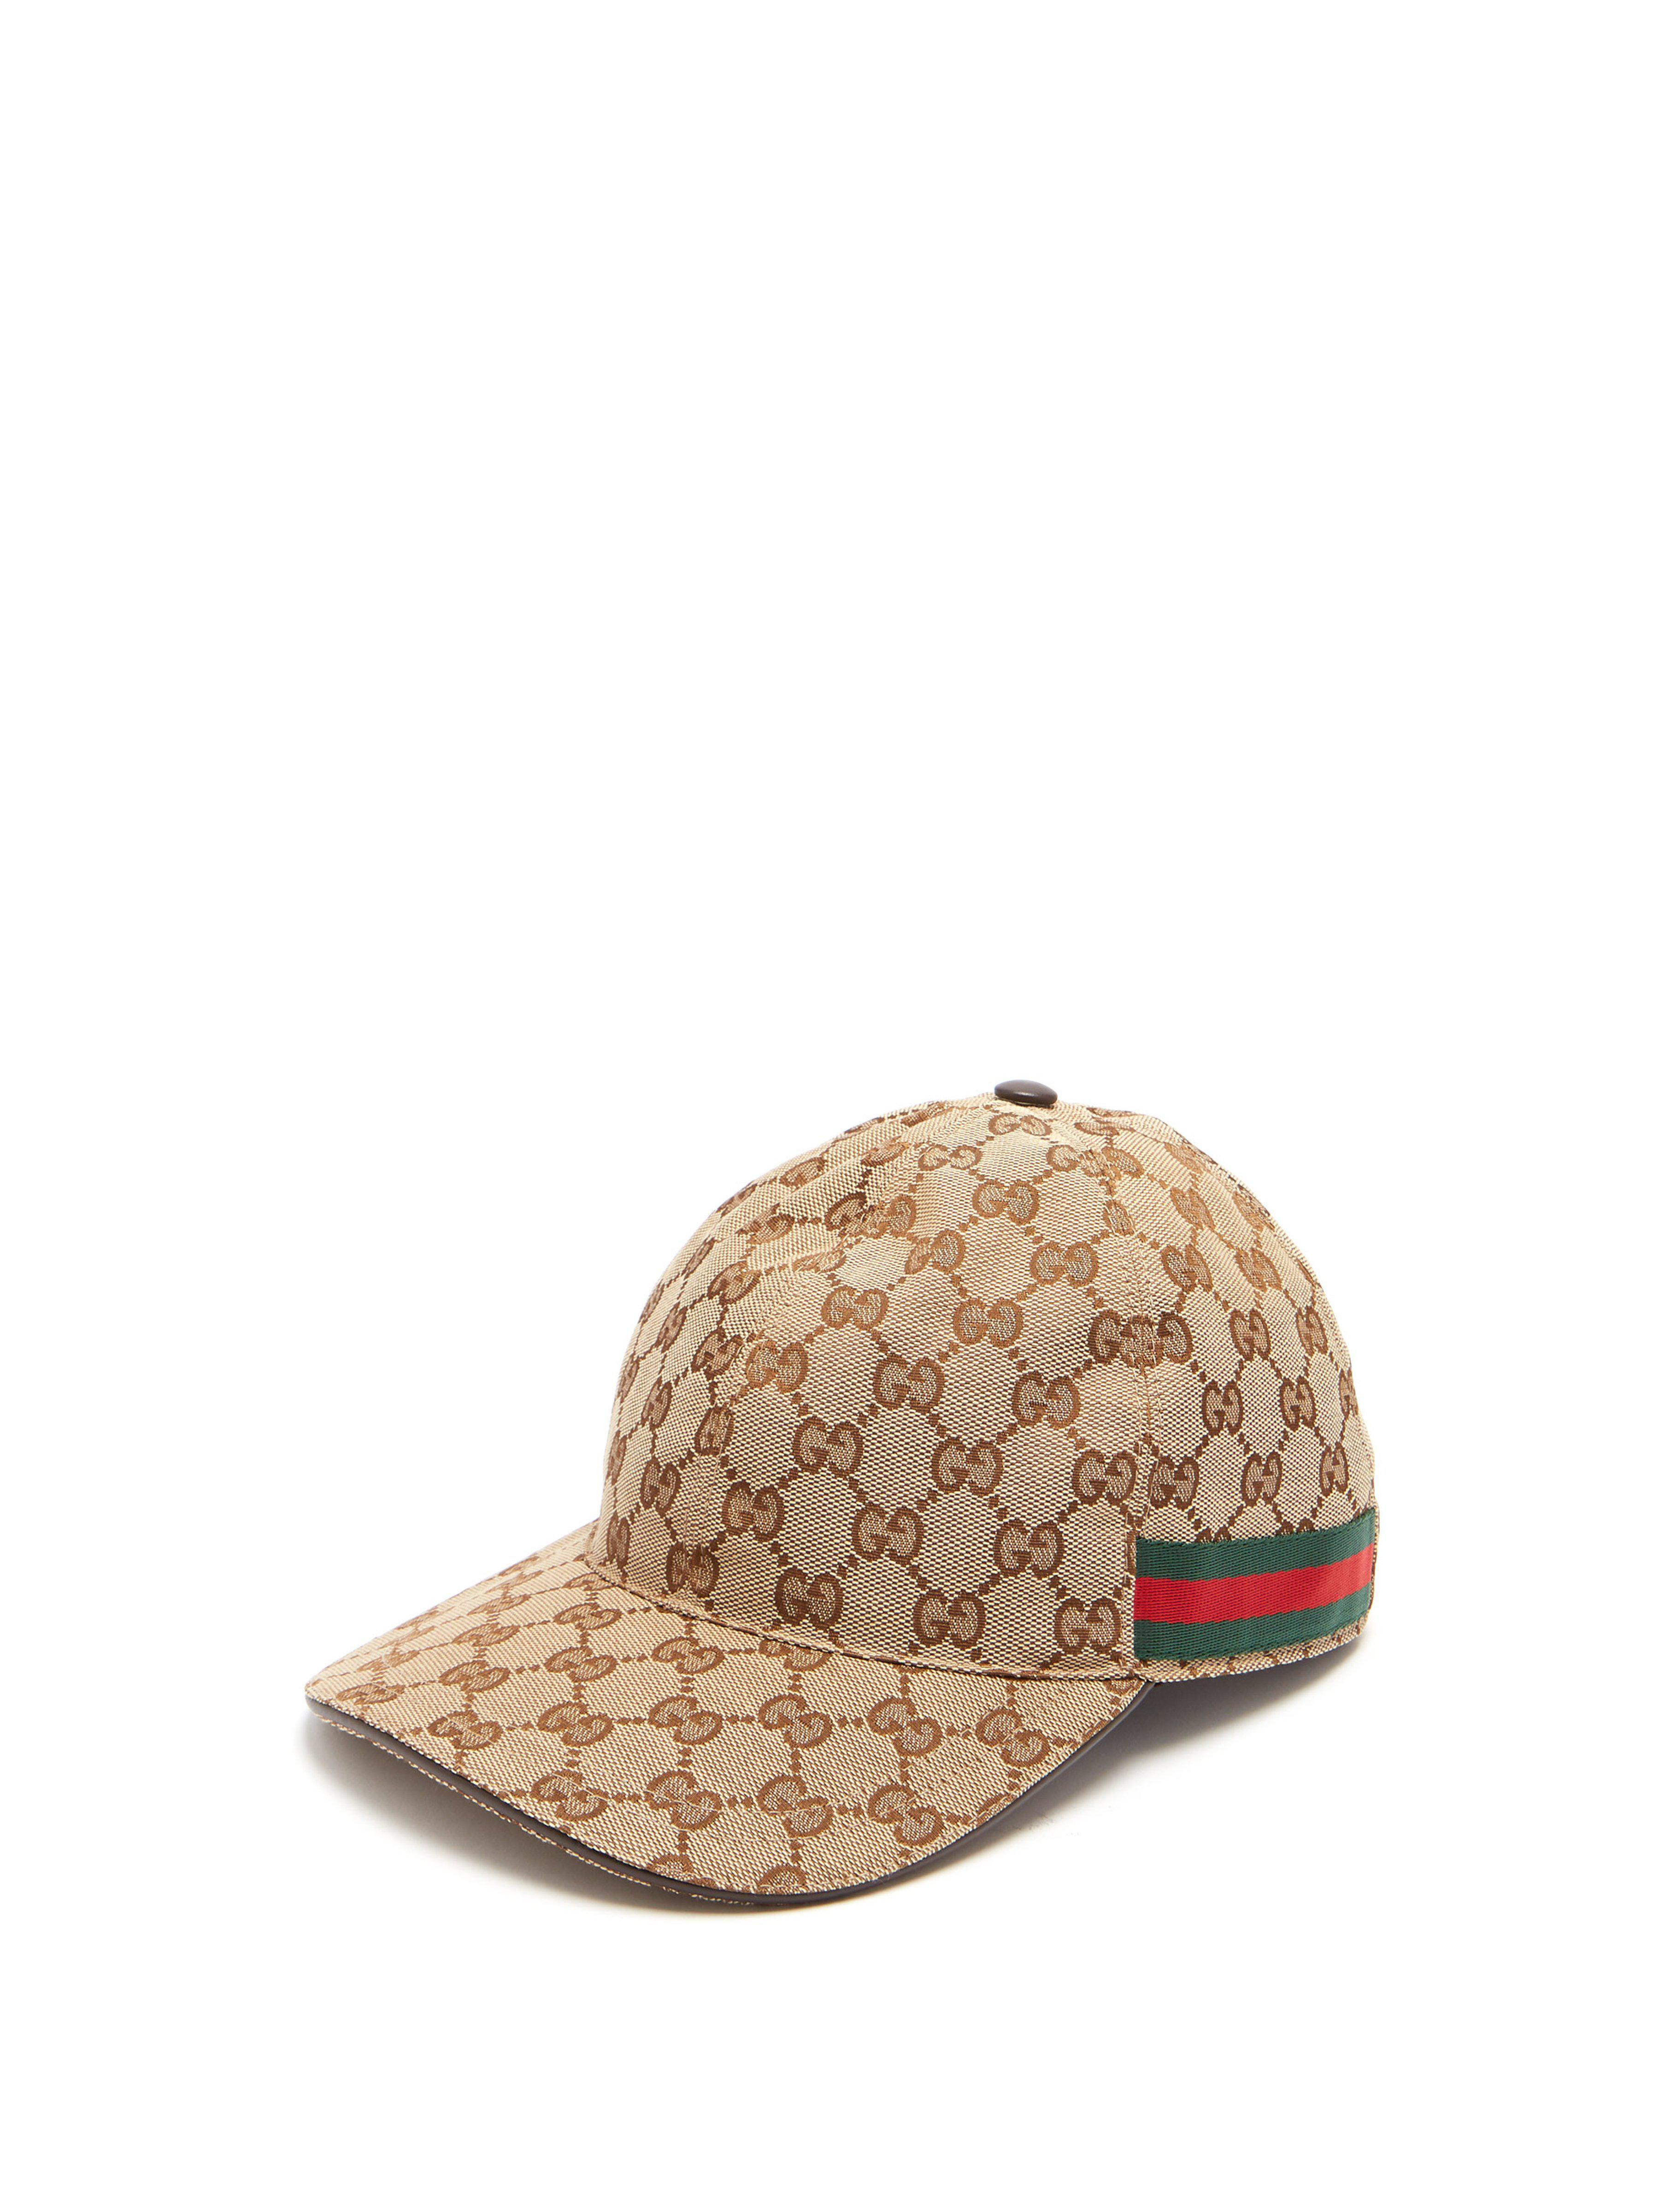 Gucci Web Stripe Gg Logo Baseball Cap in Natural for Men - Lyst 4d6850b0be81